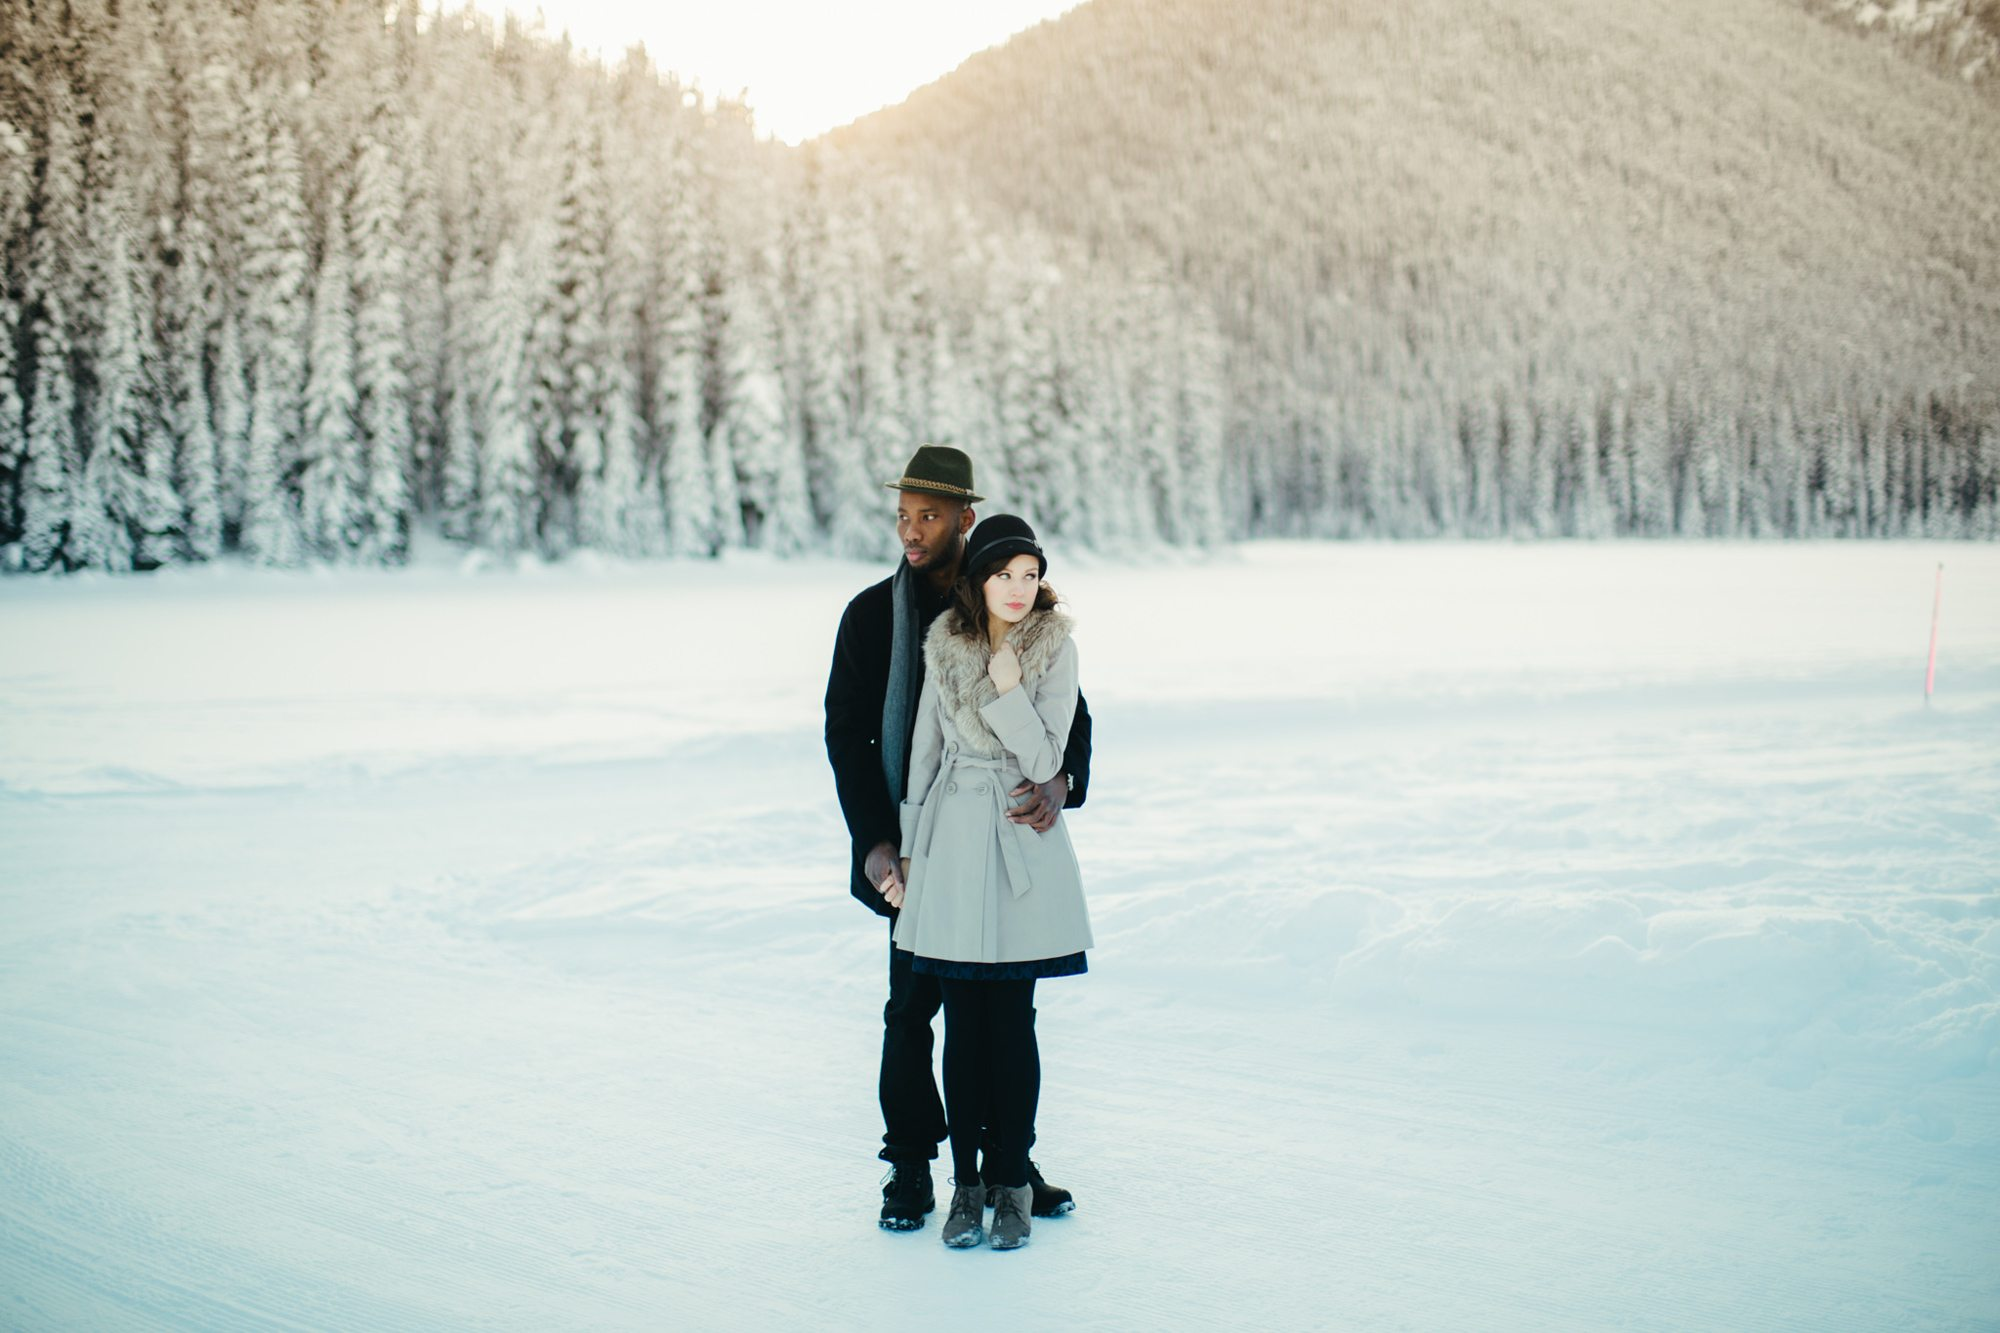 049-adventure-engagement-photographer